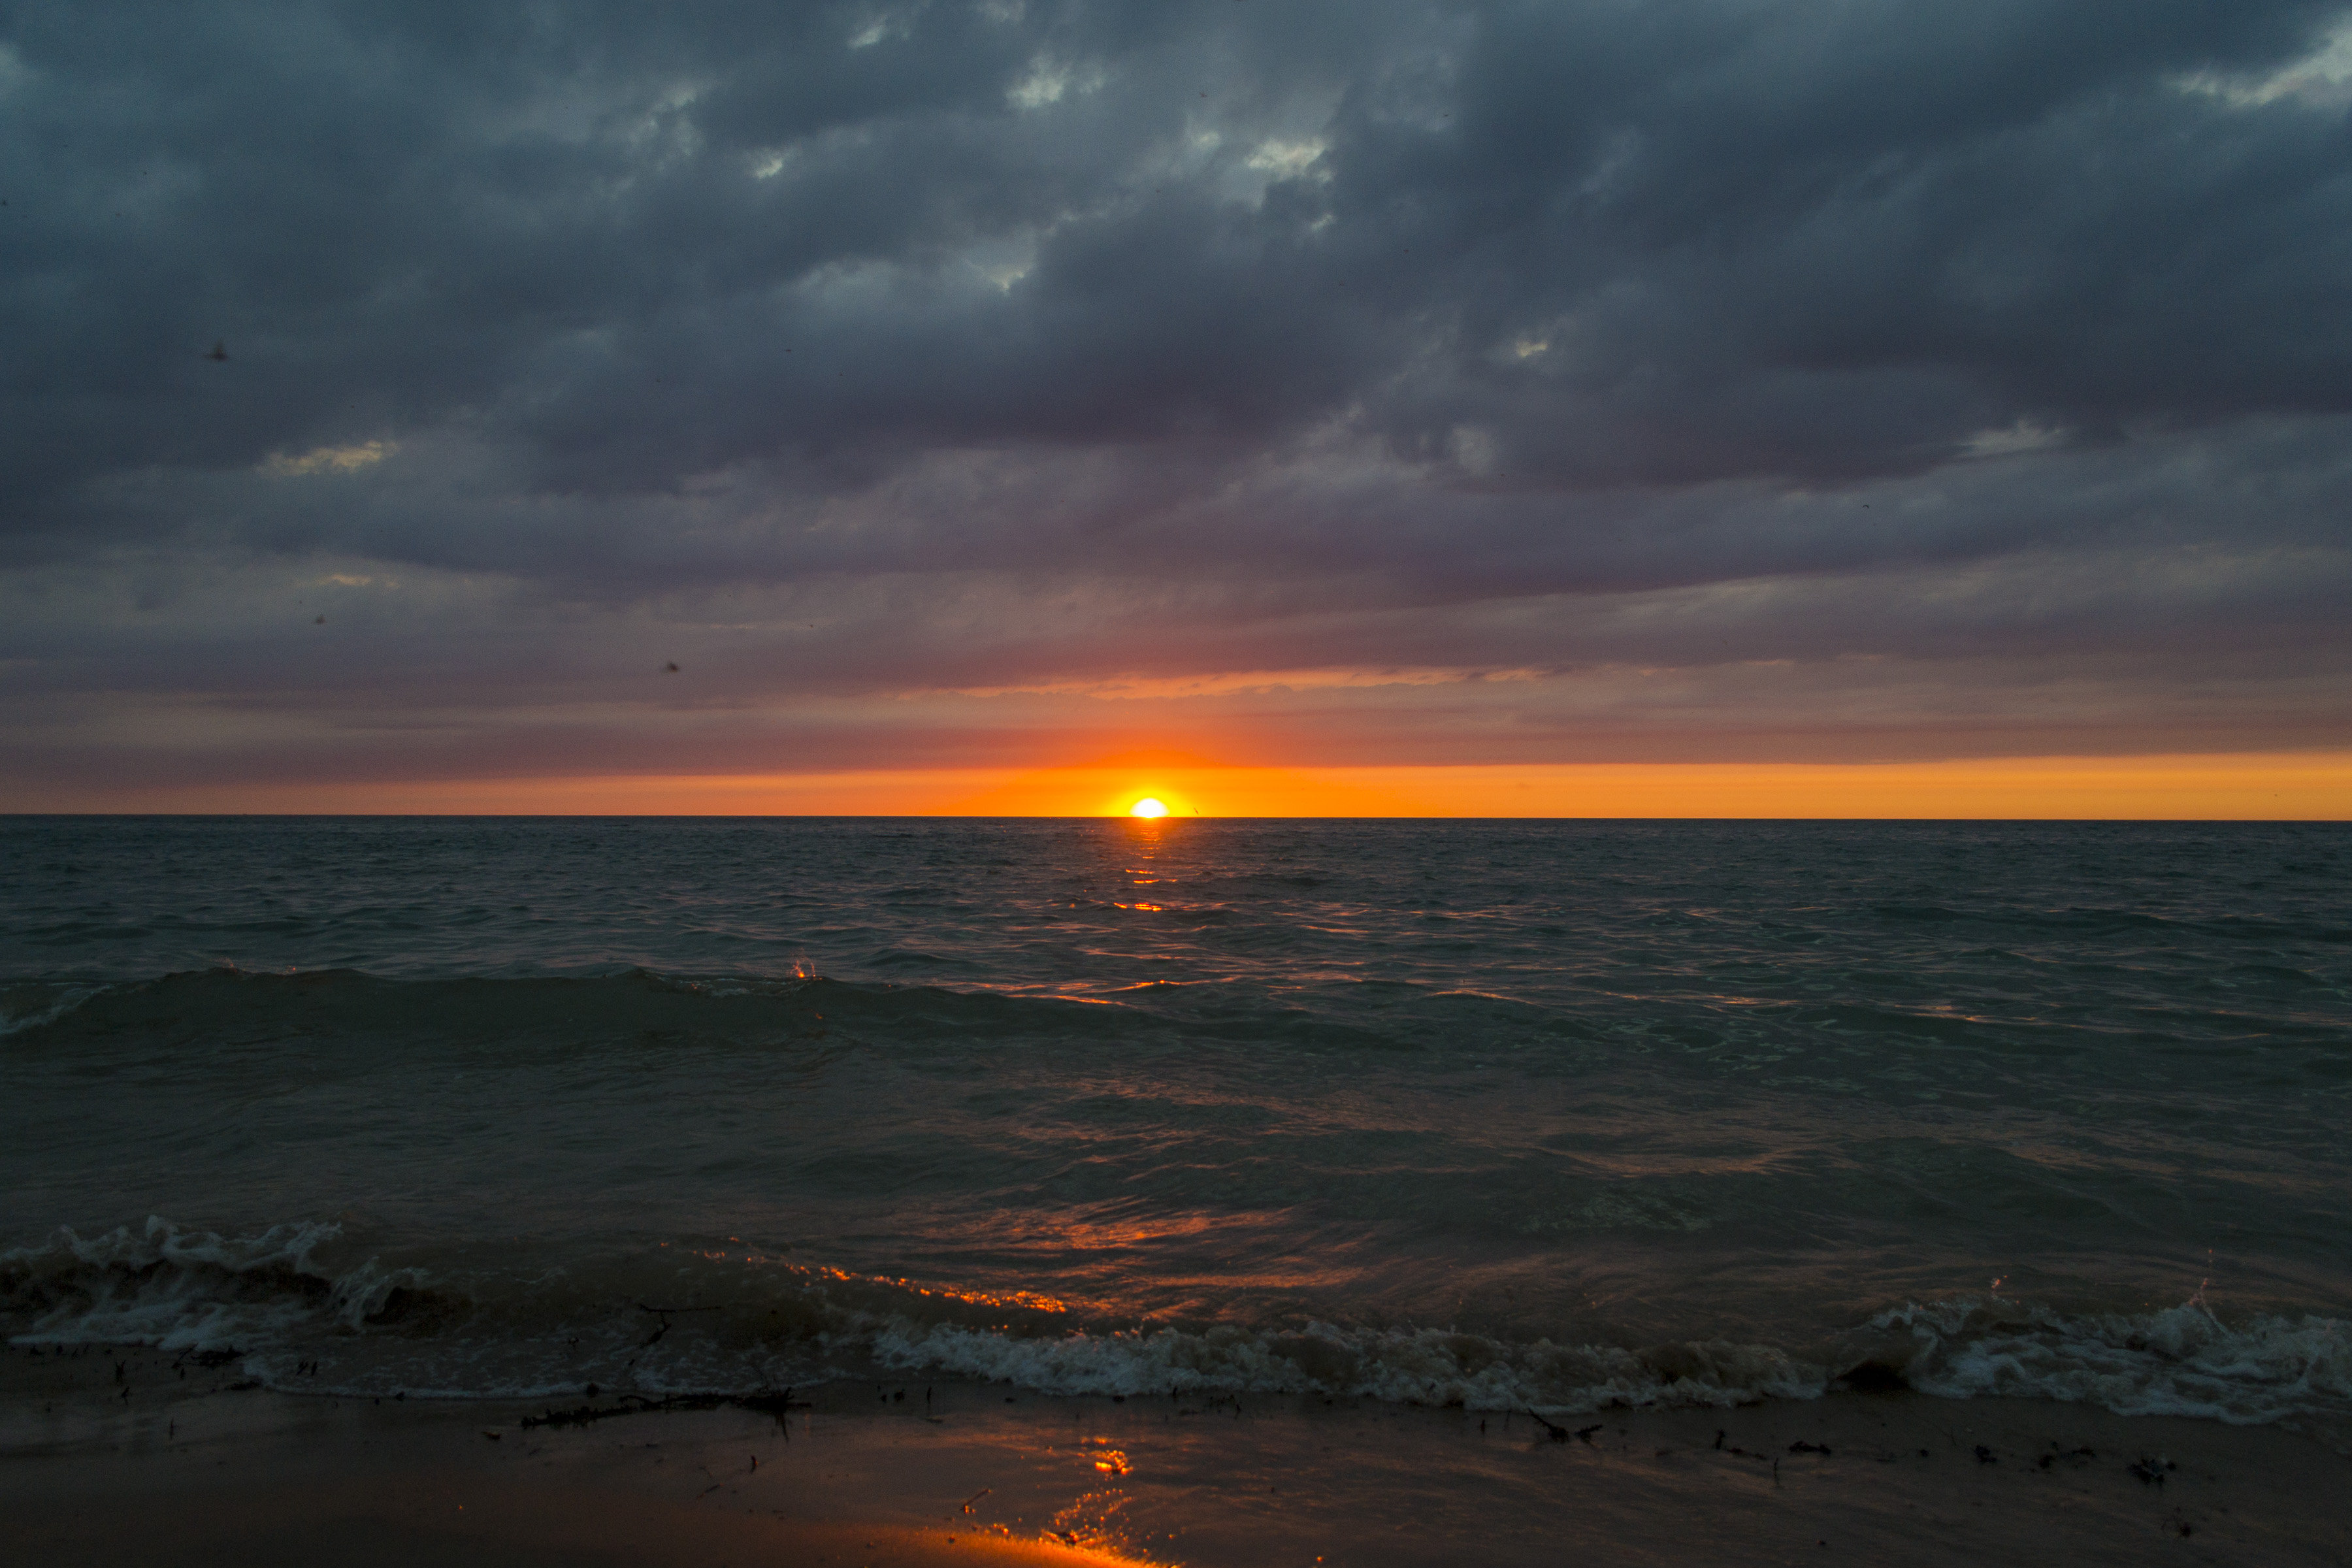 Stormy sun setting